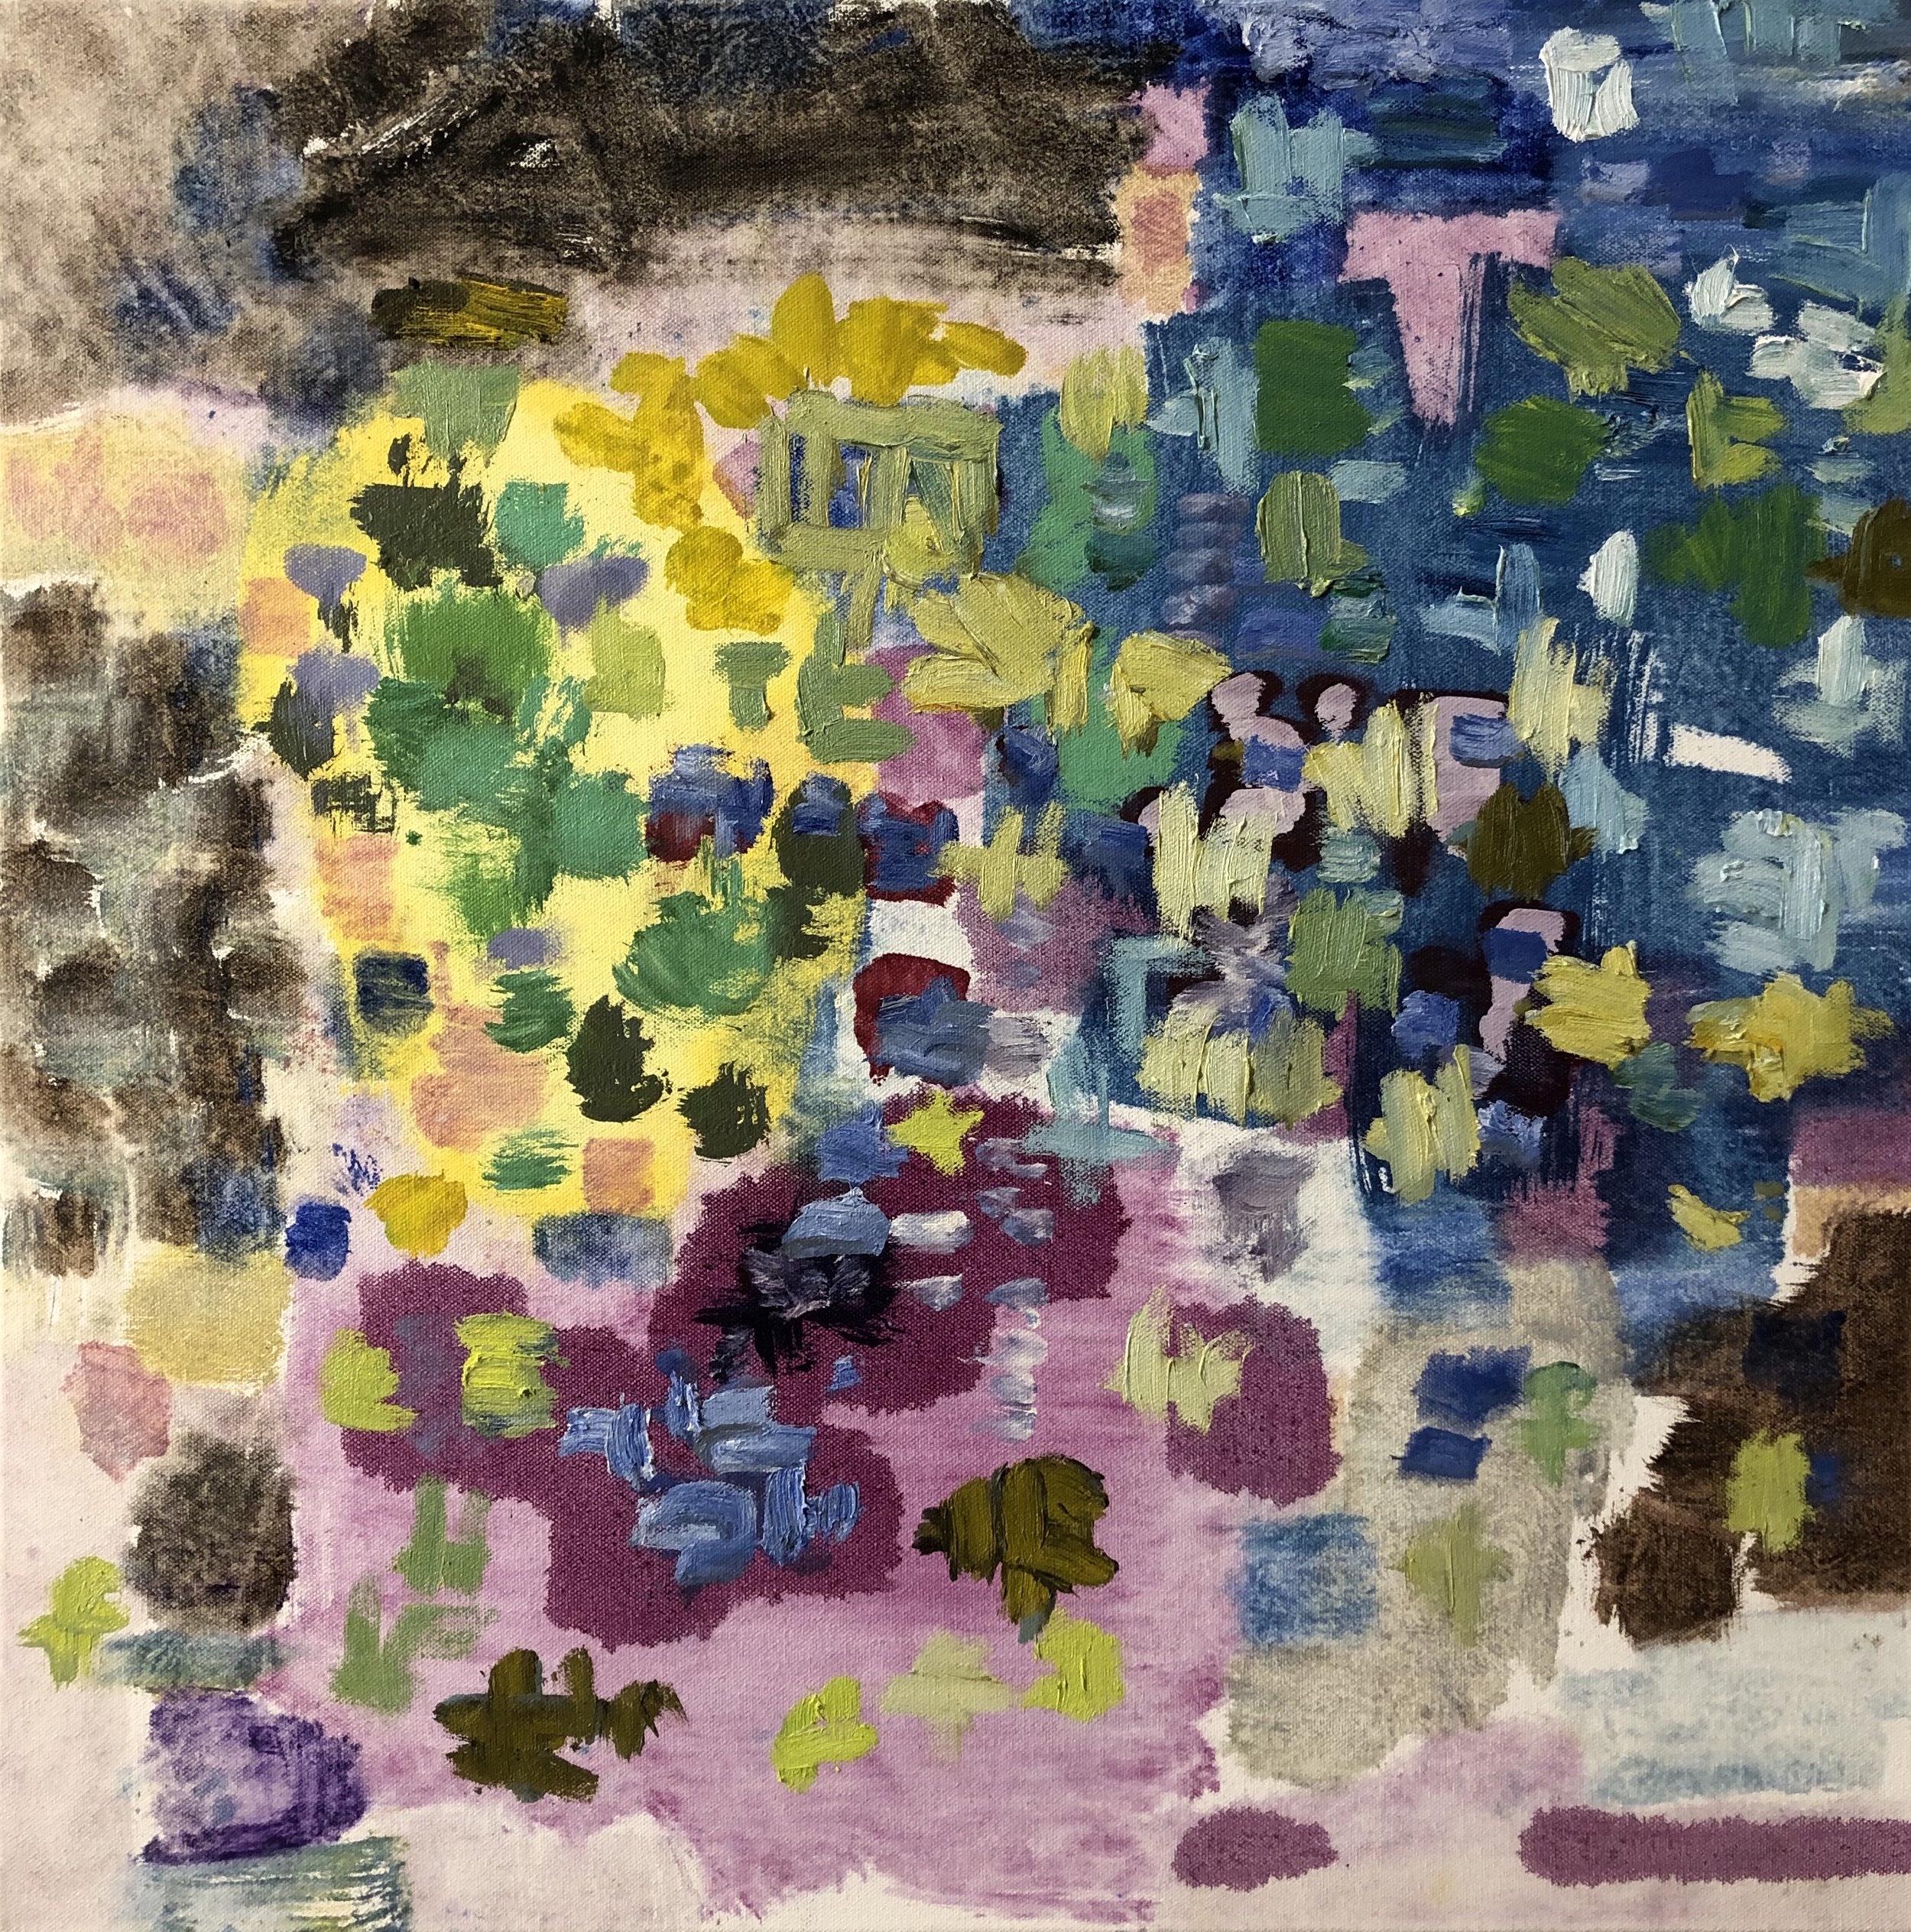 Composition Mosaic, 2019